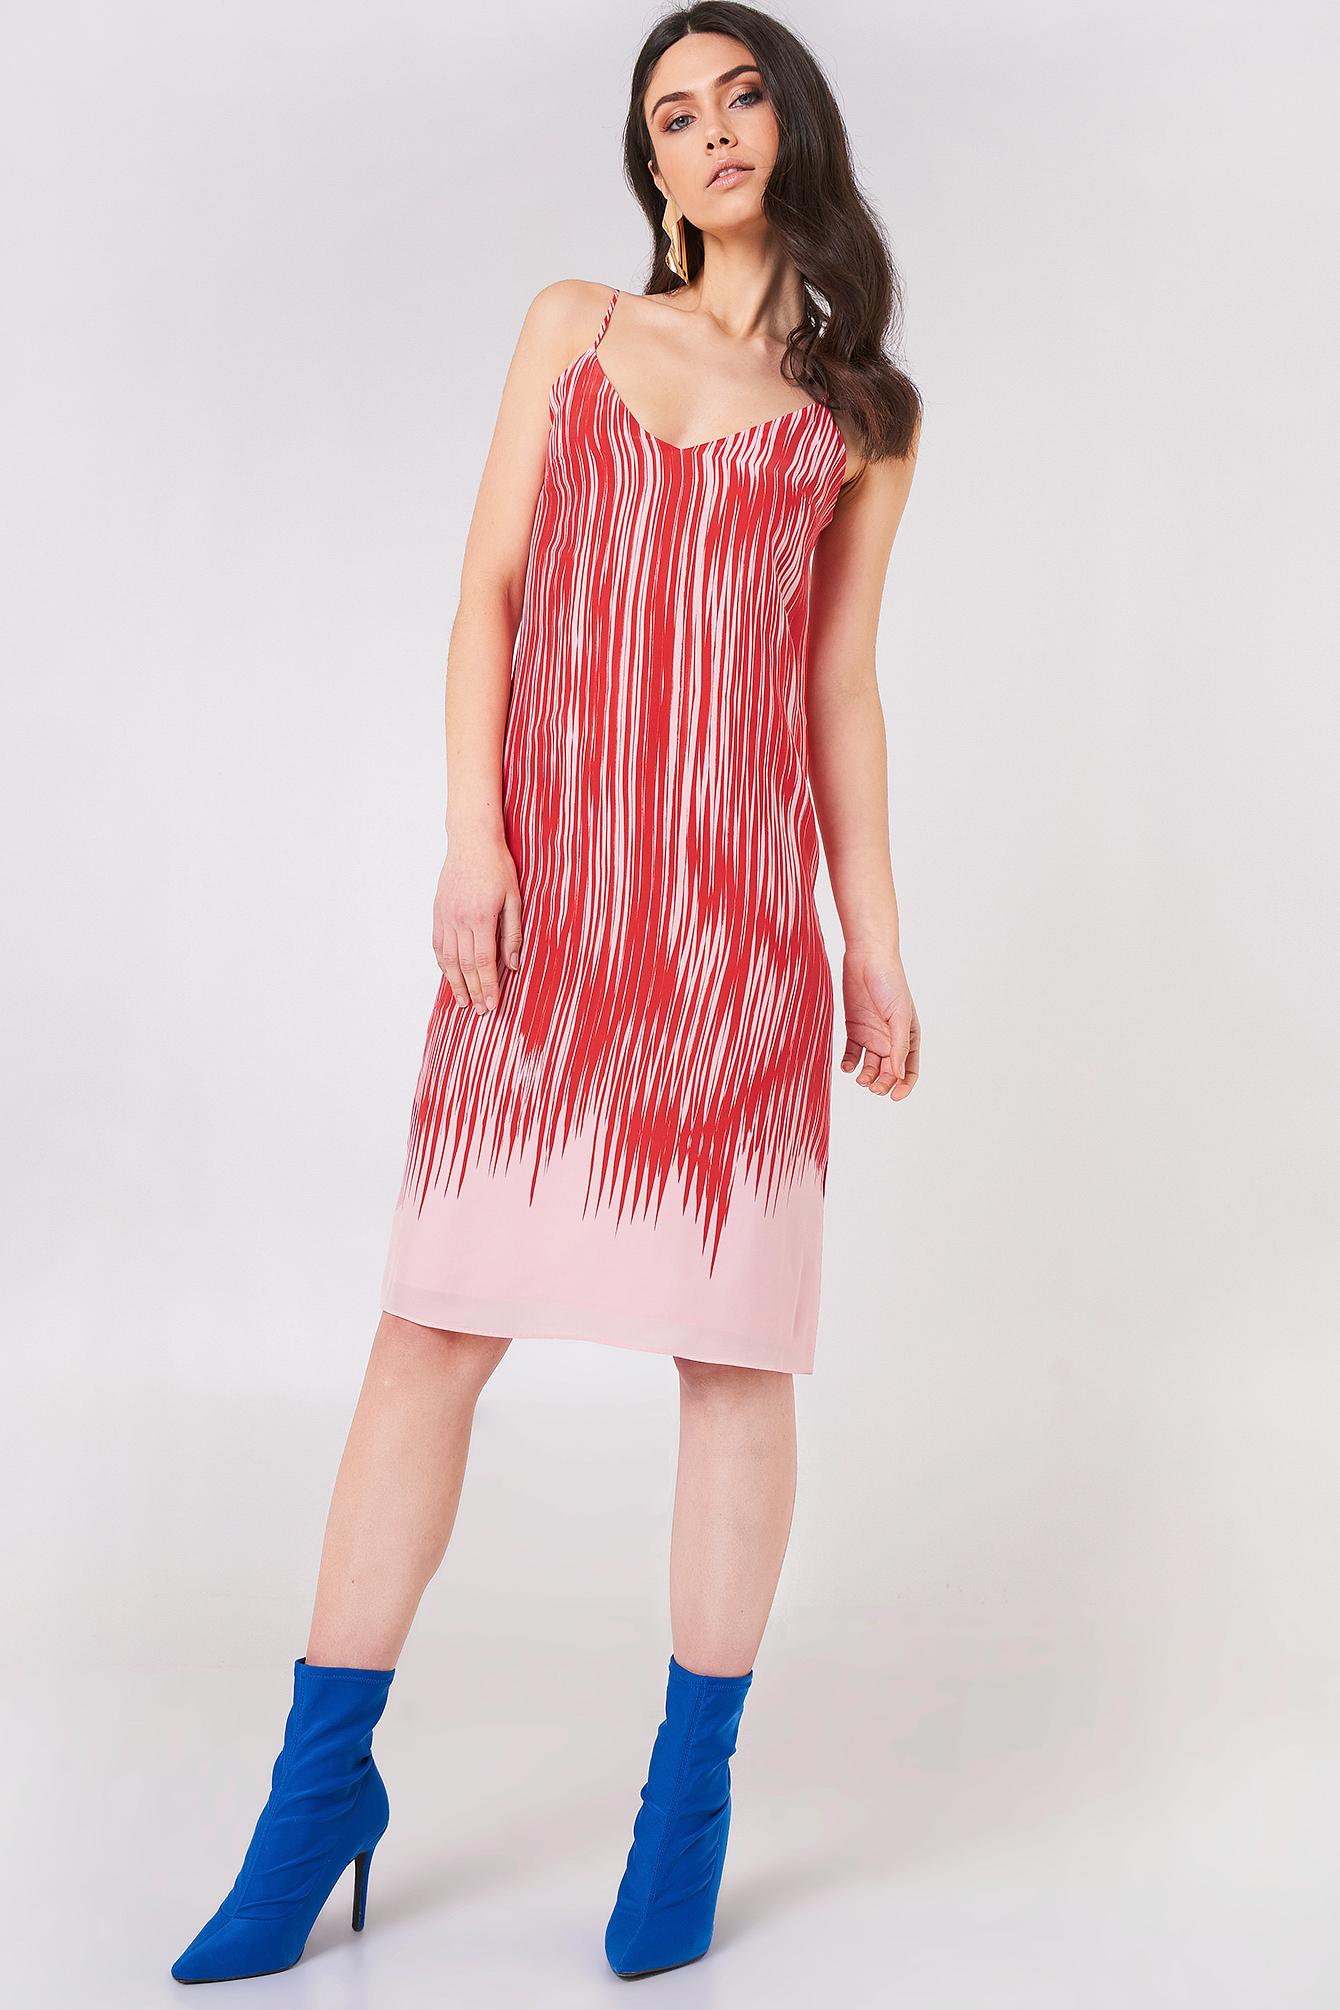 FILIPPA K STRAPPY PRINT DRESS - RED, MULTICOLOR